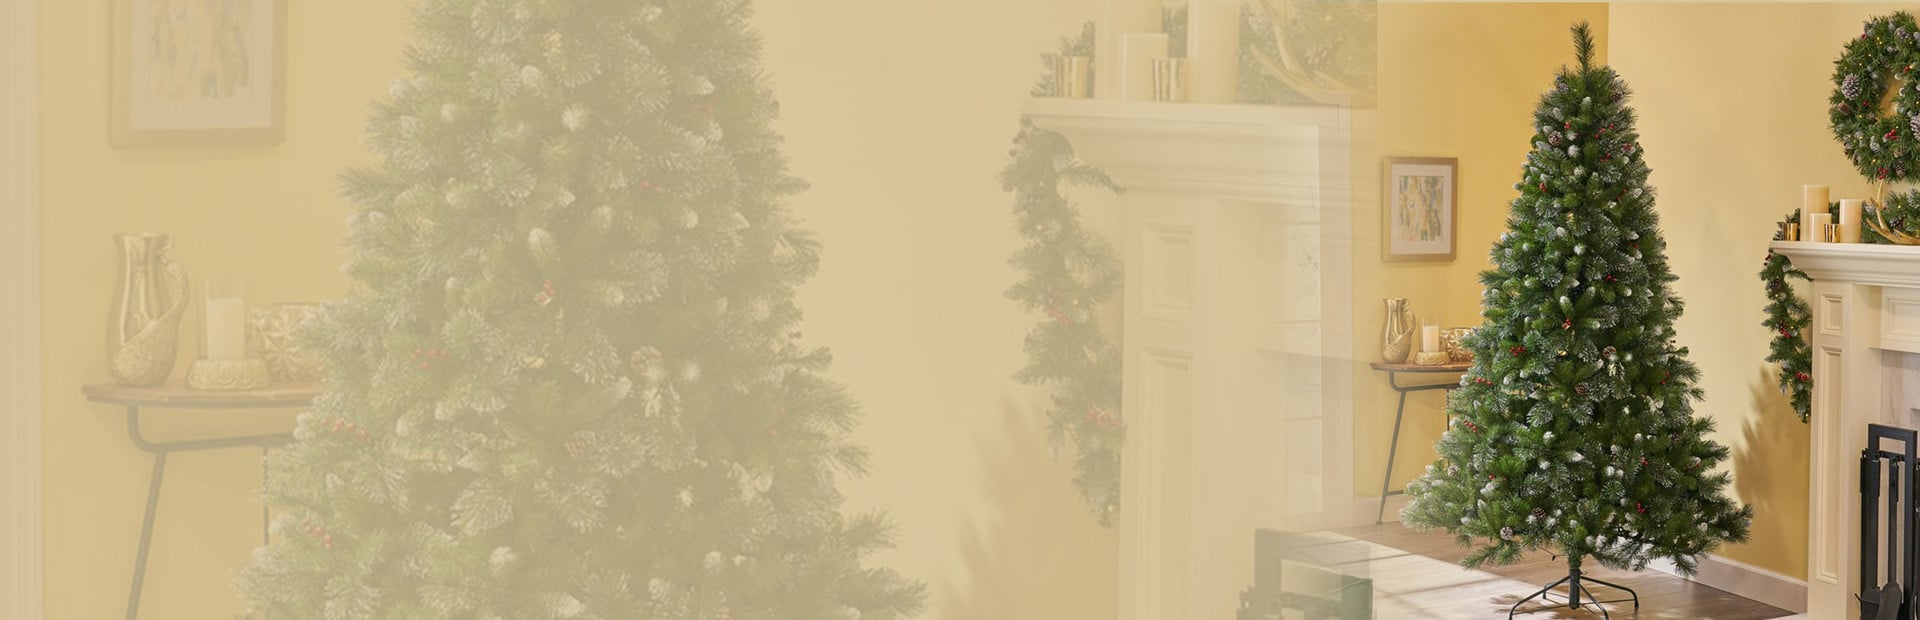 Unlit Christmas Tree Banner